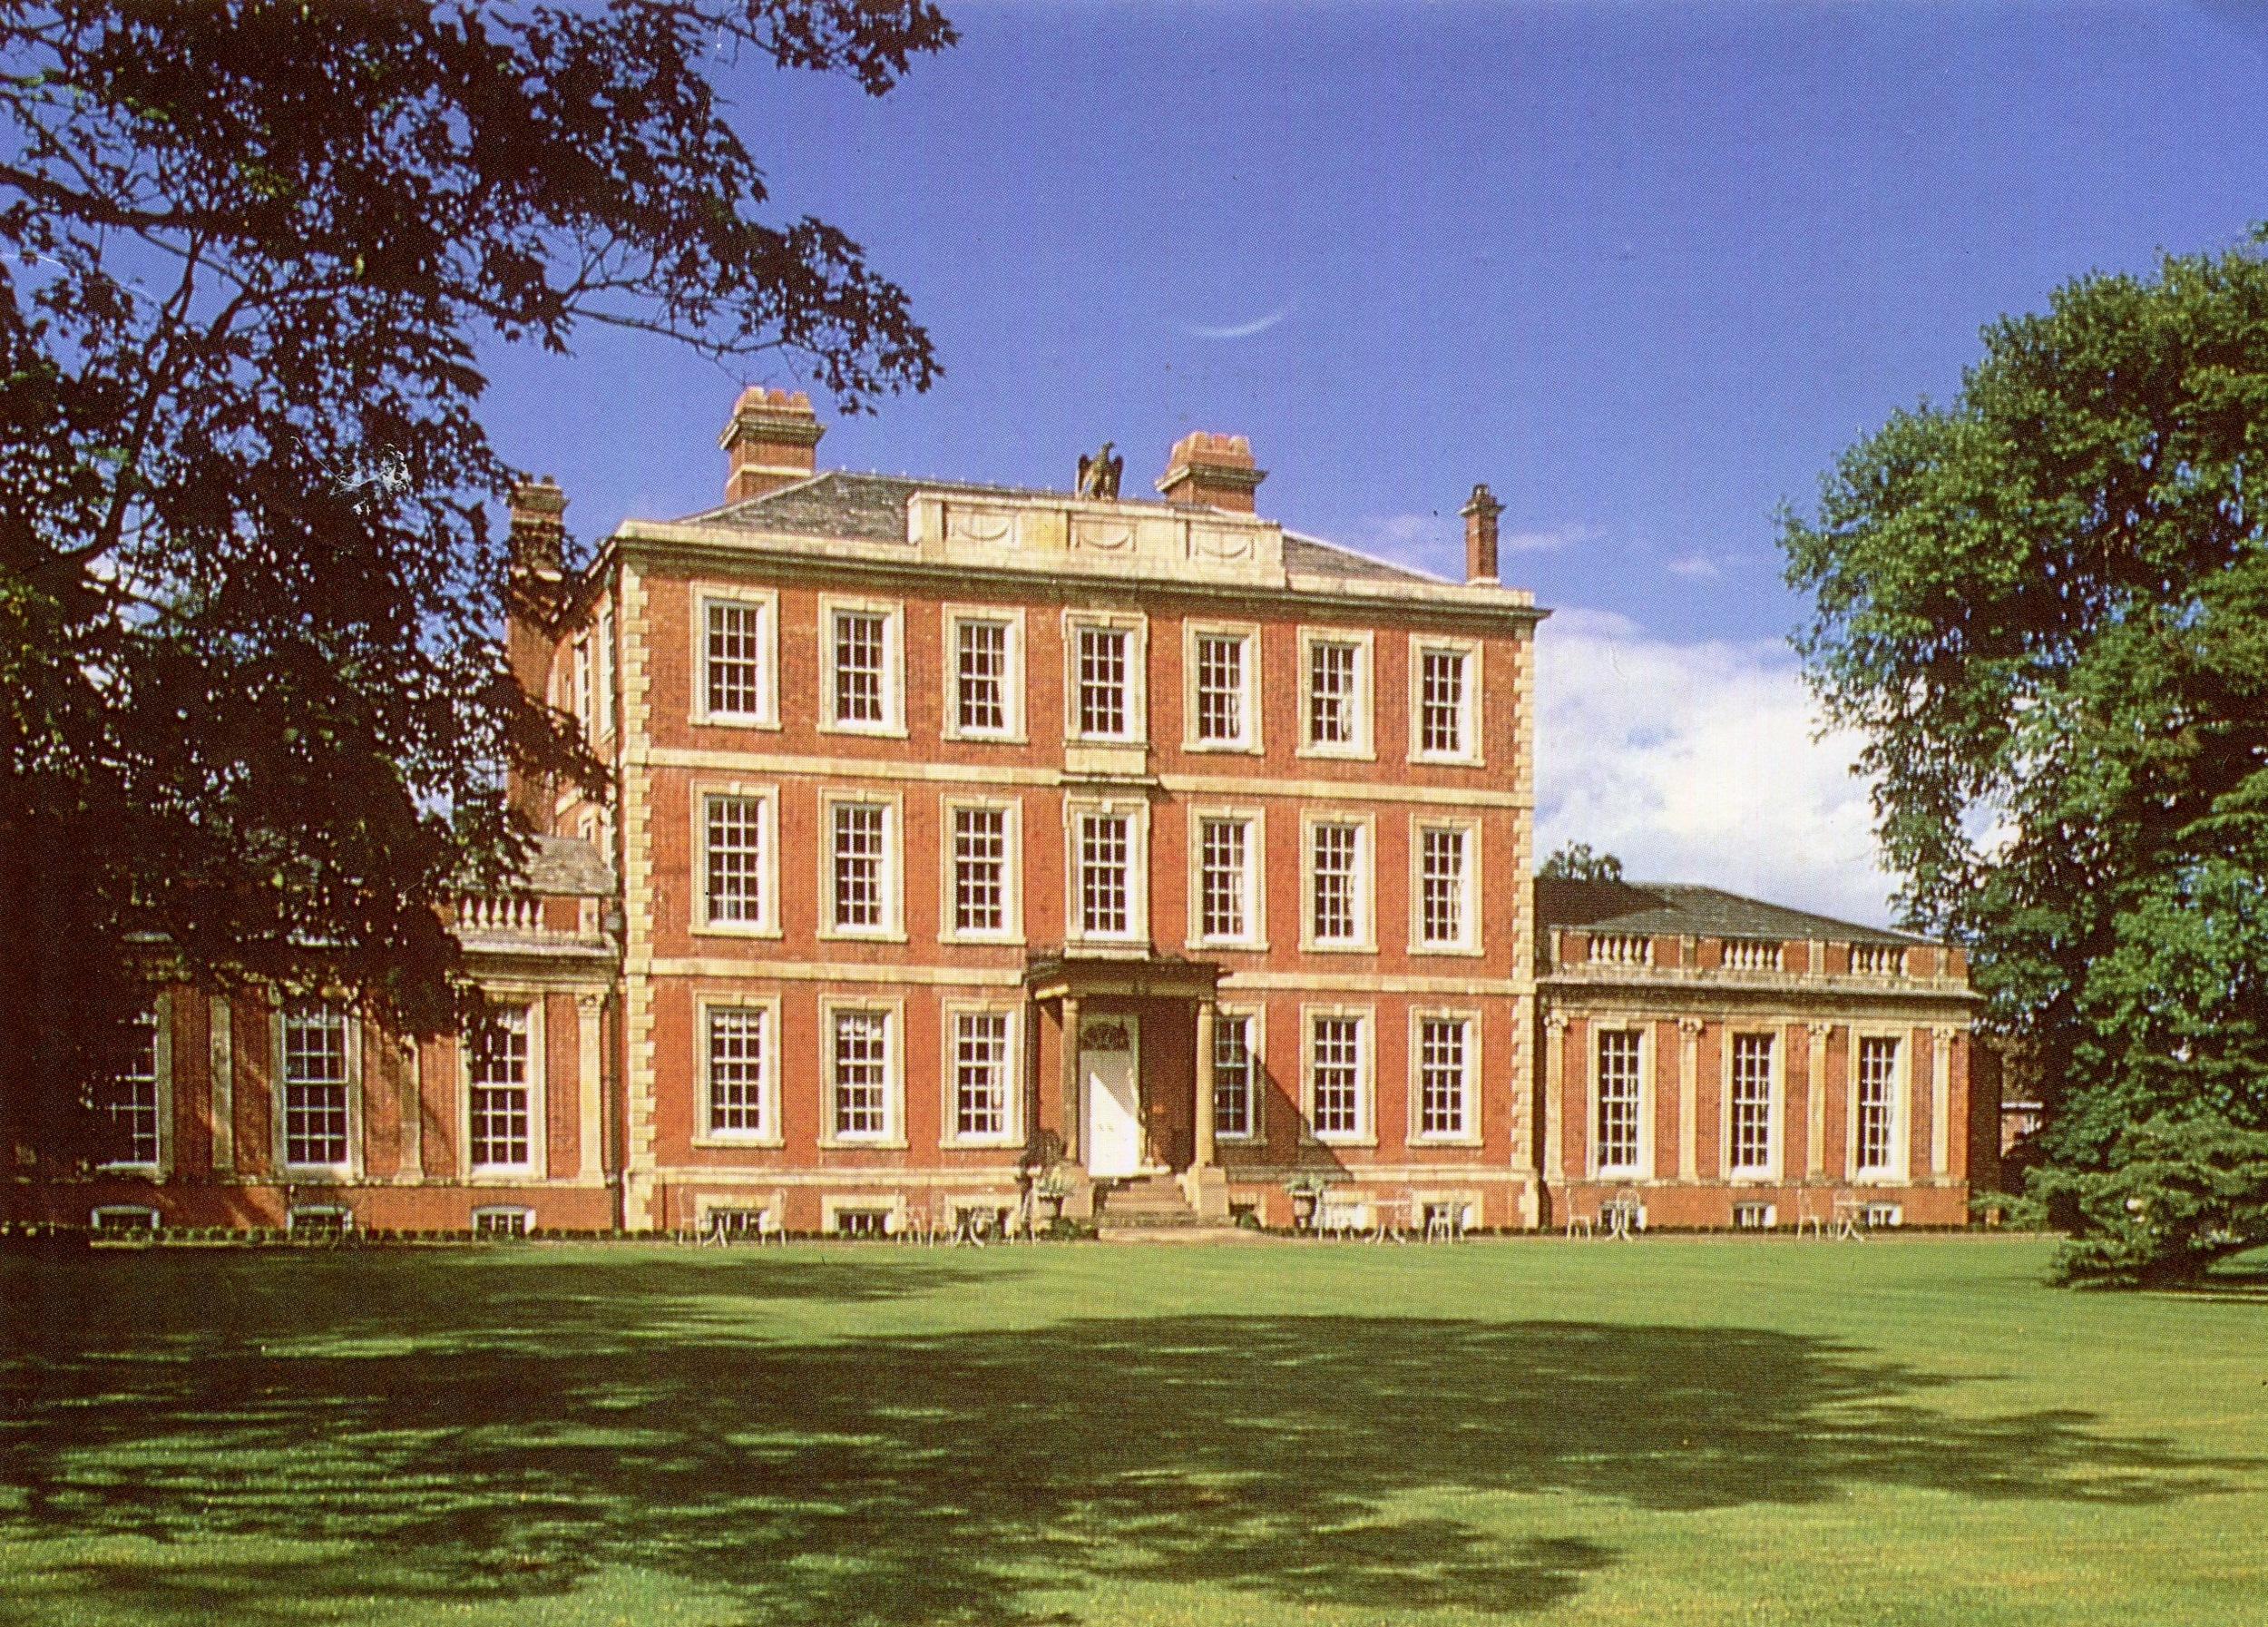 Middlethorpe Hall, England